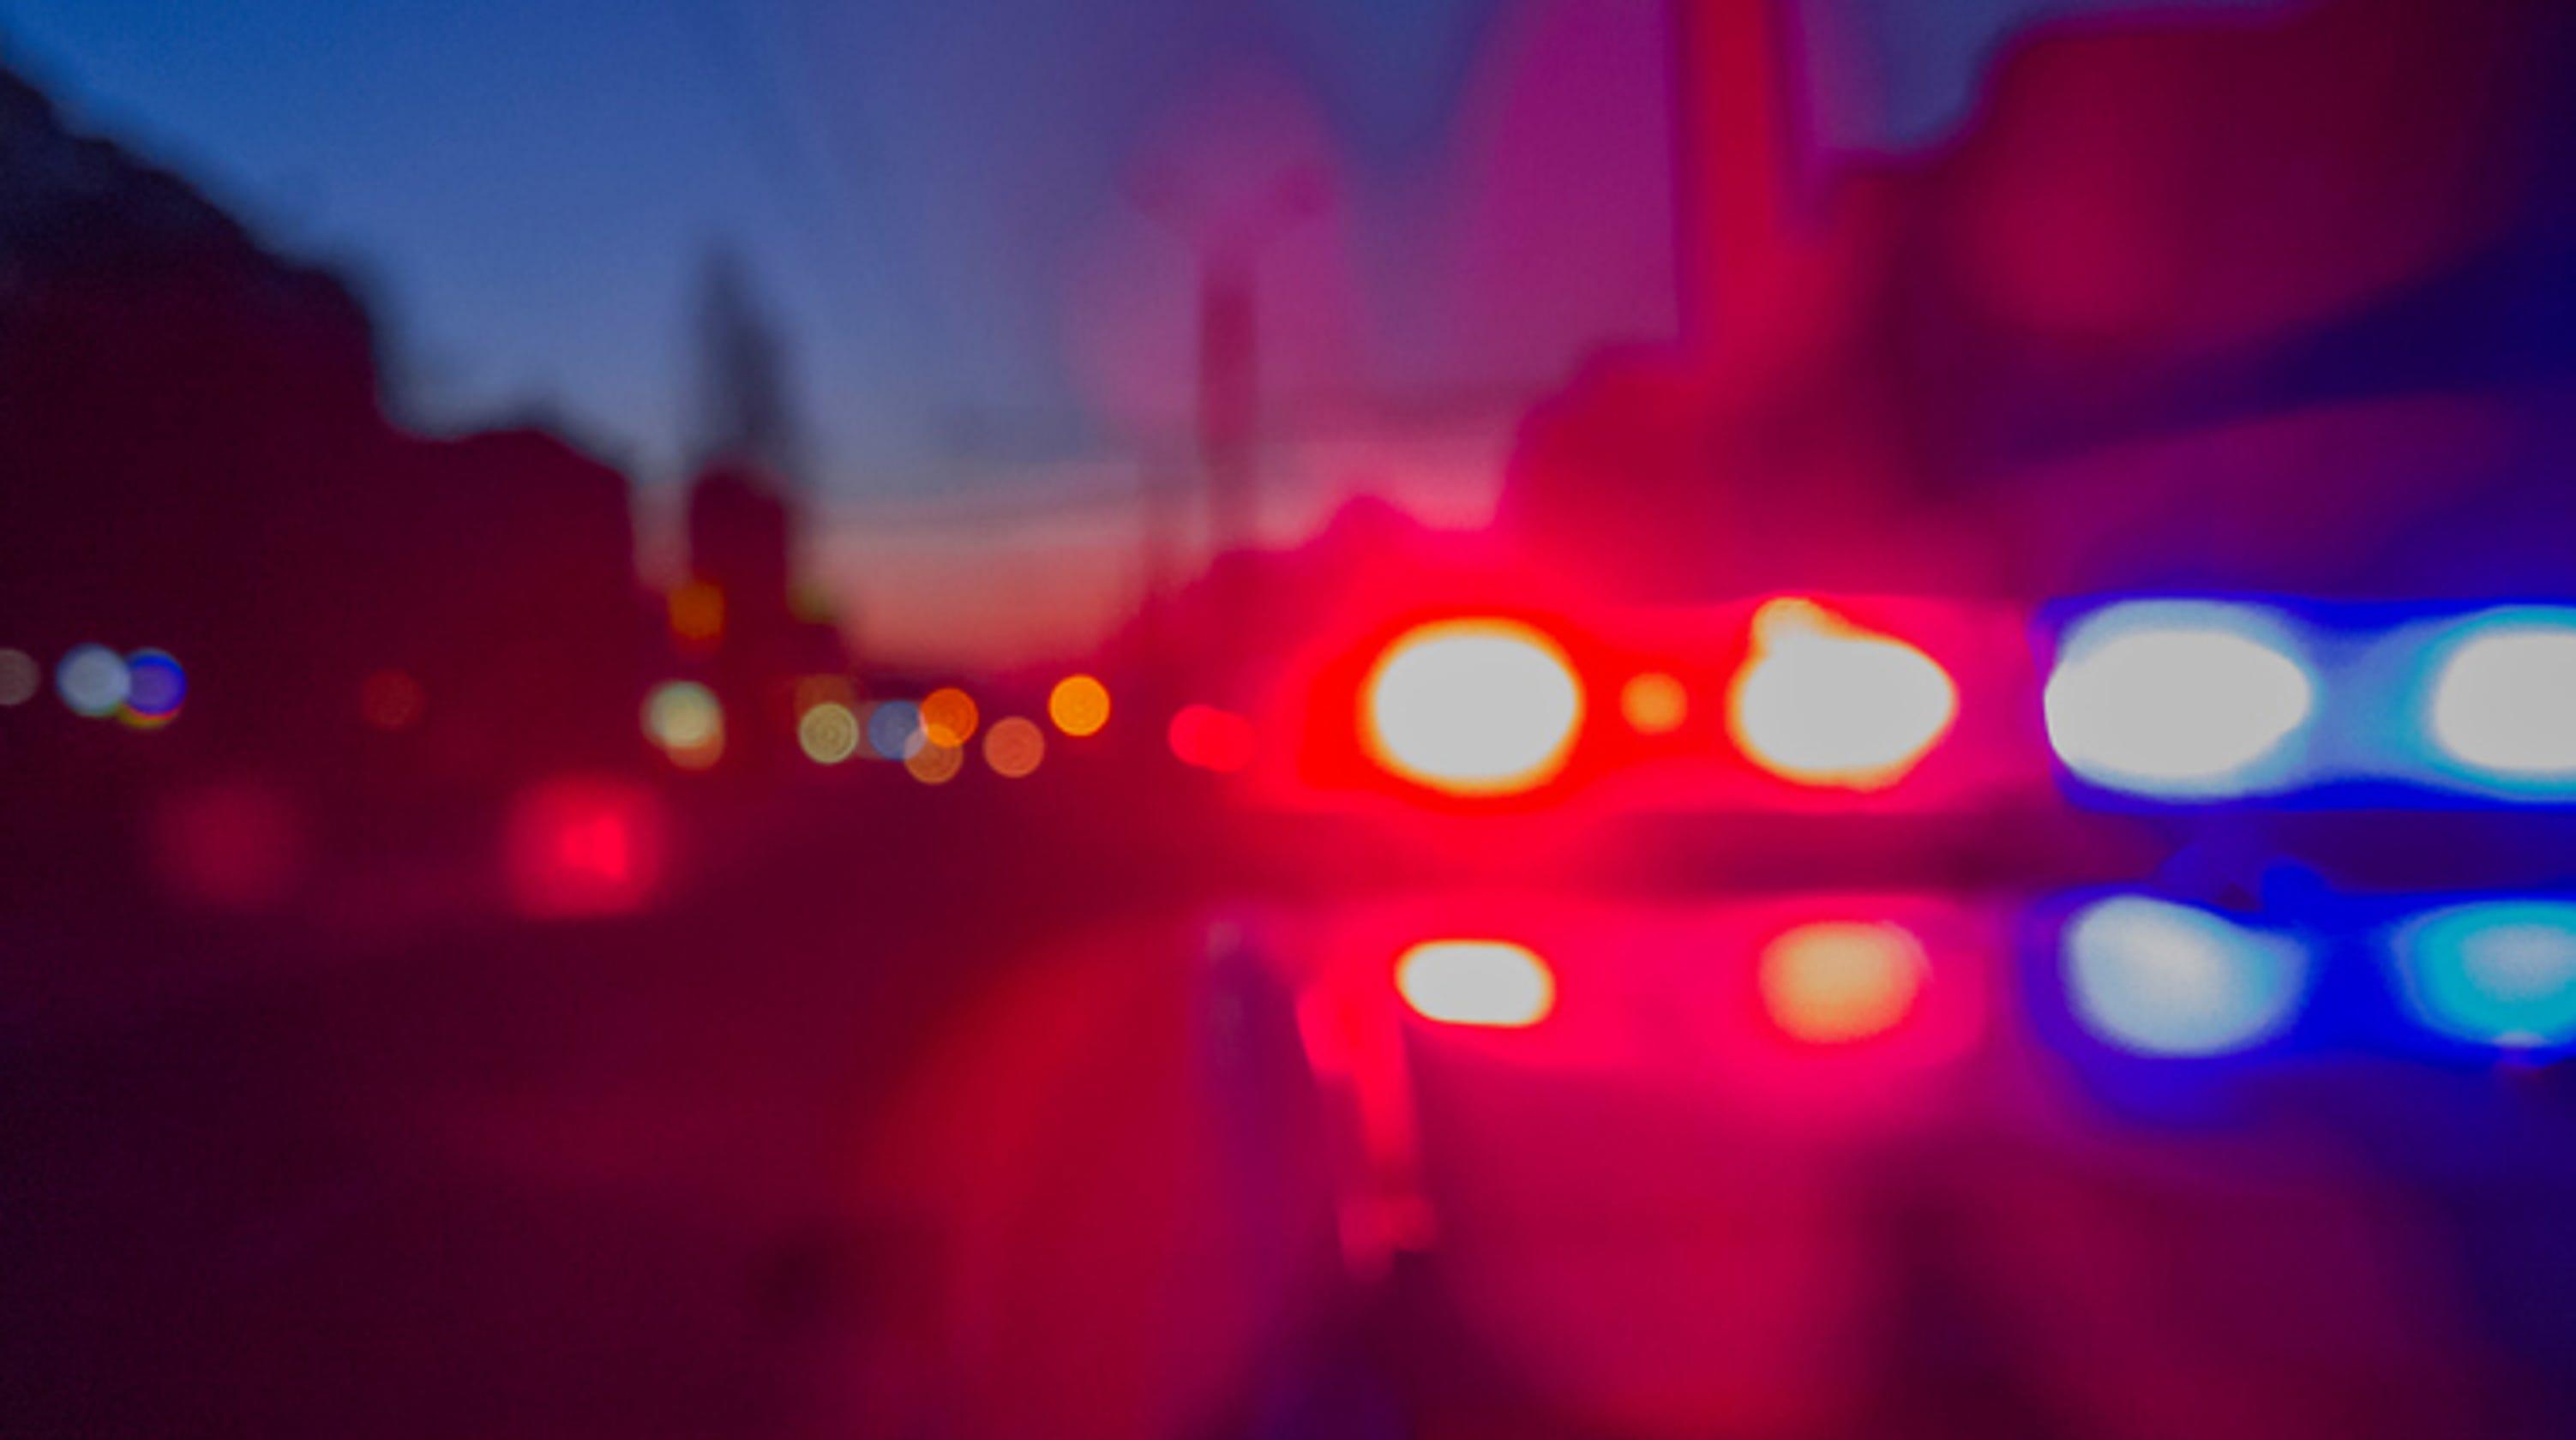 Victim of fatal motorcycle crash at Abrams identified